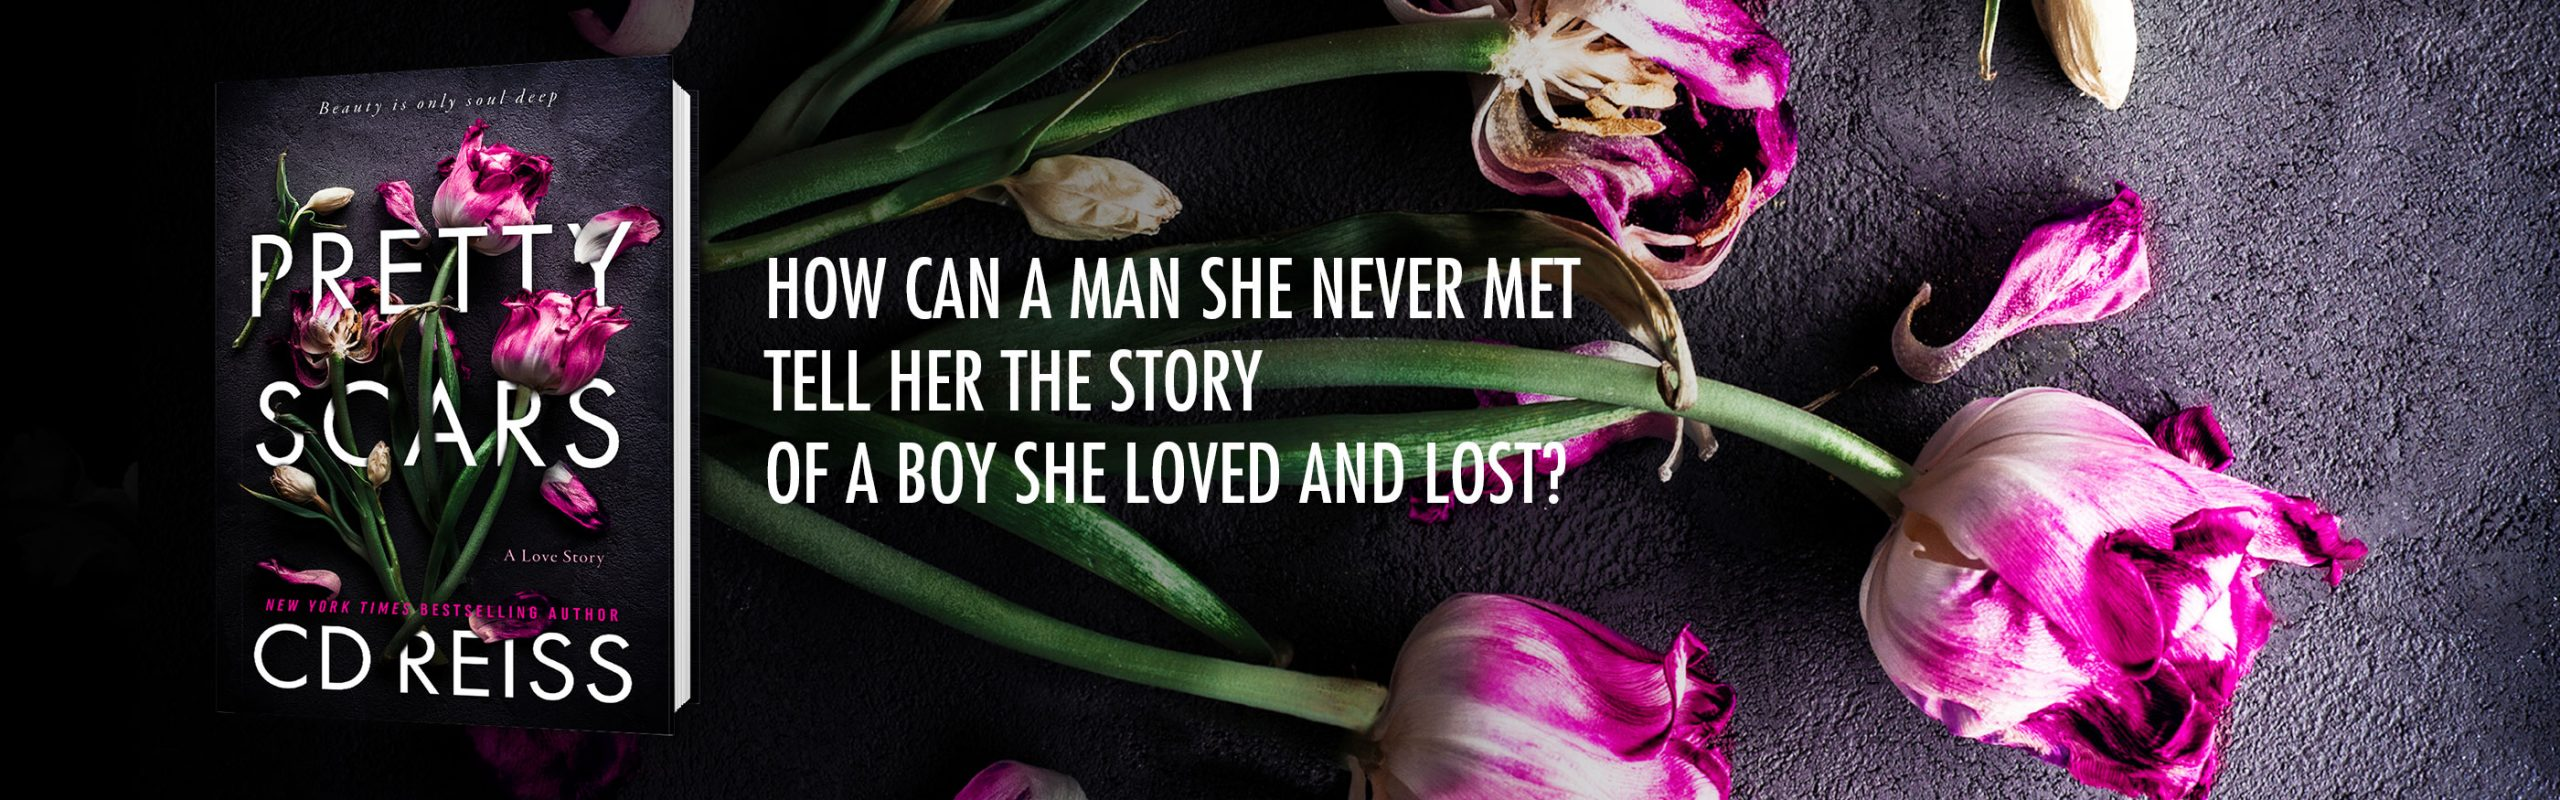 PRETTY-SCARS romance